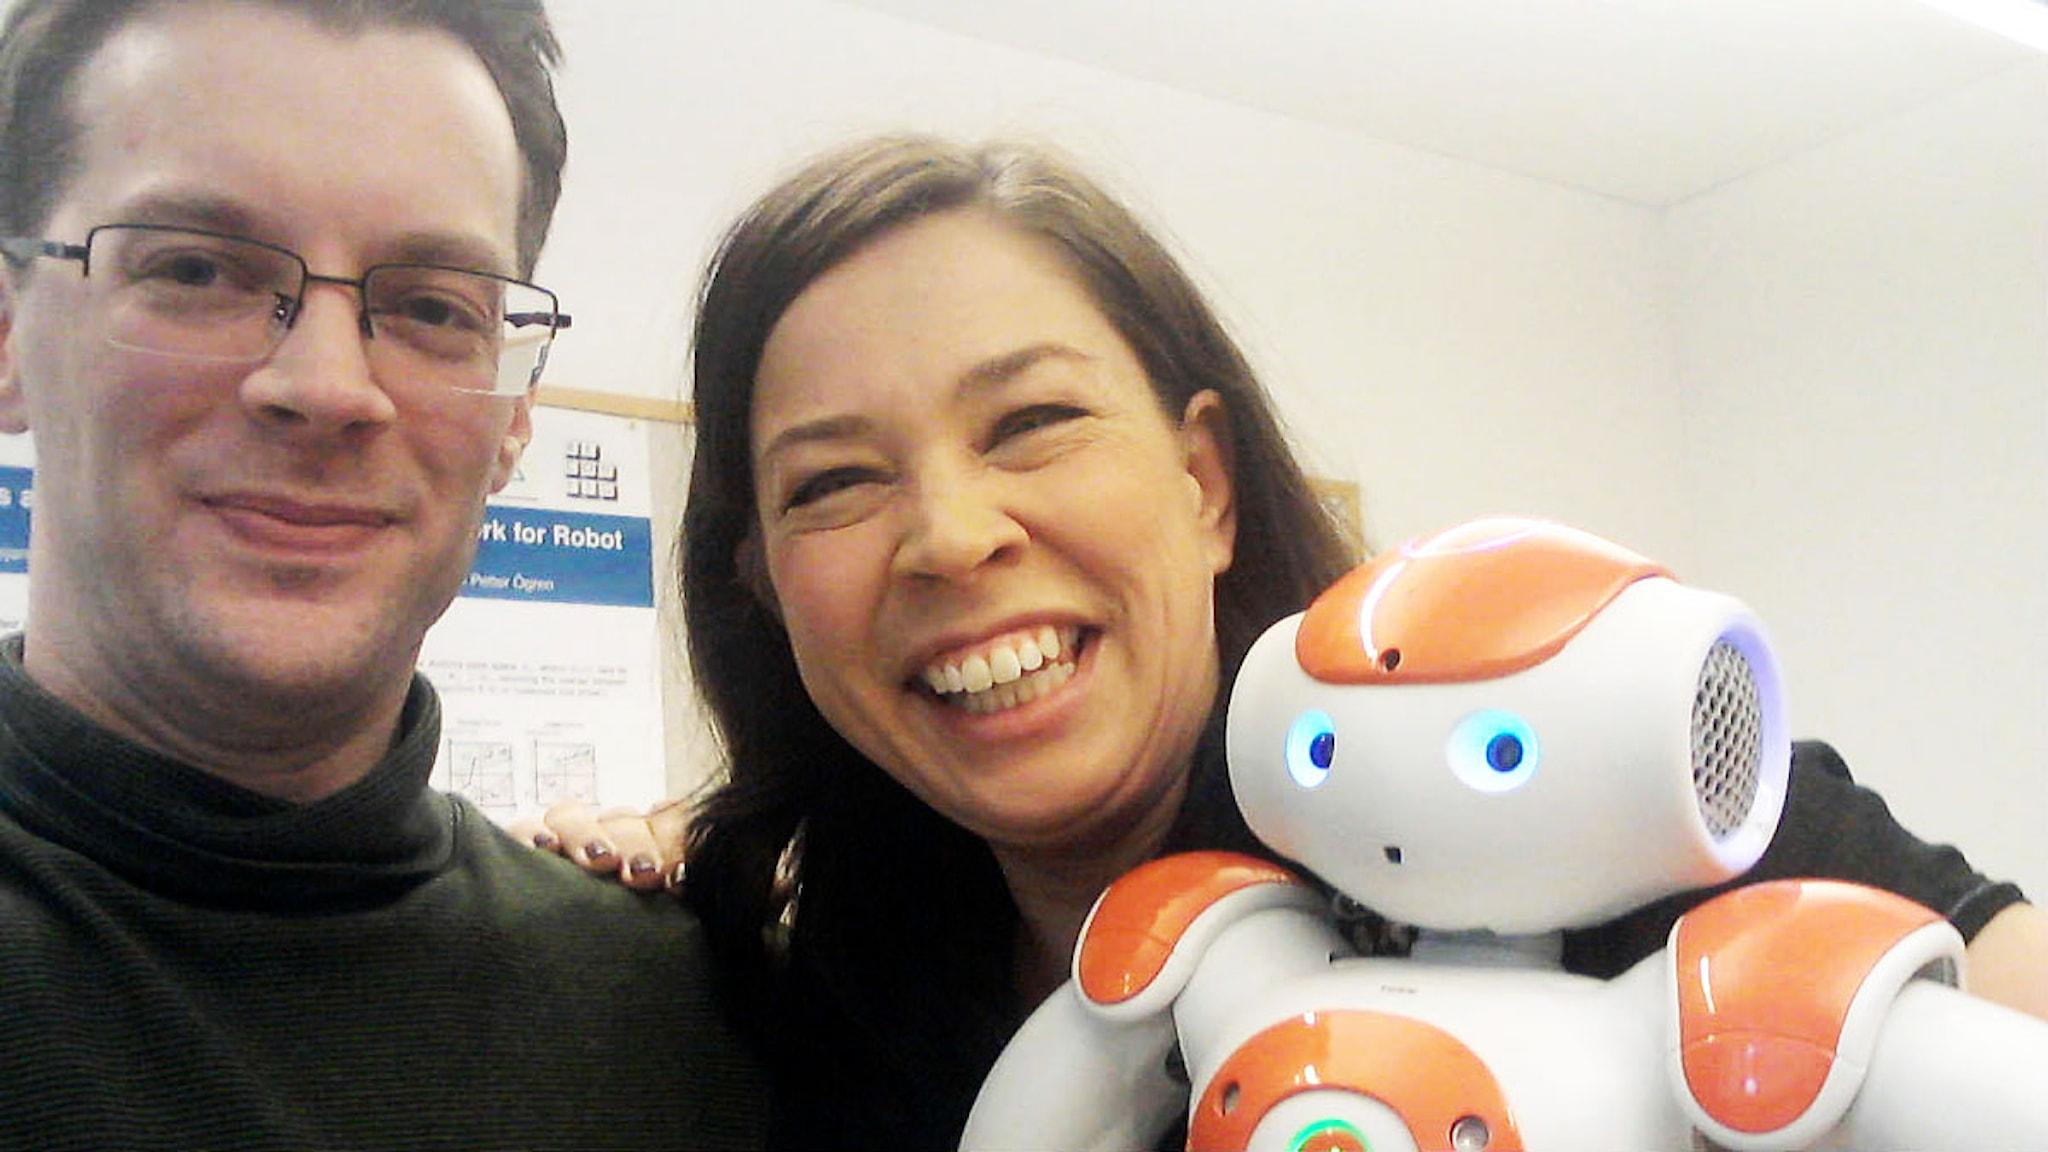 Christian Smith, Marie Lundström och Roboten Nao